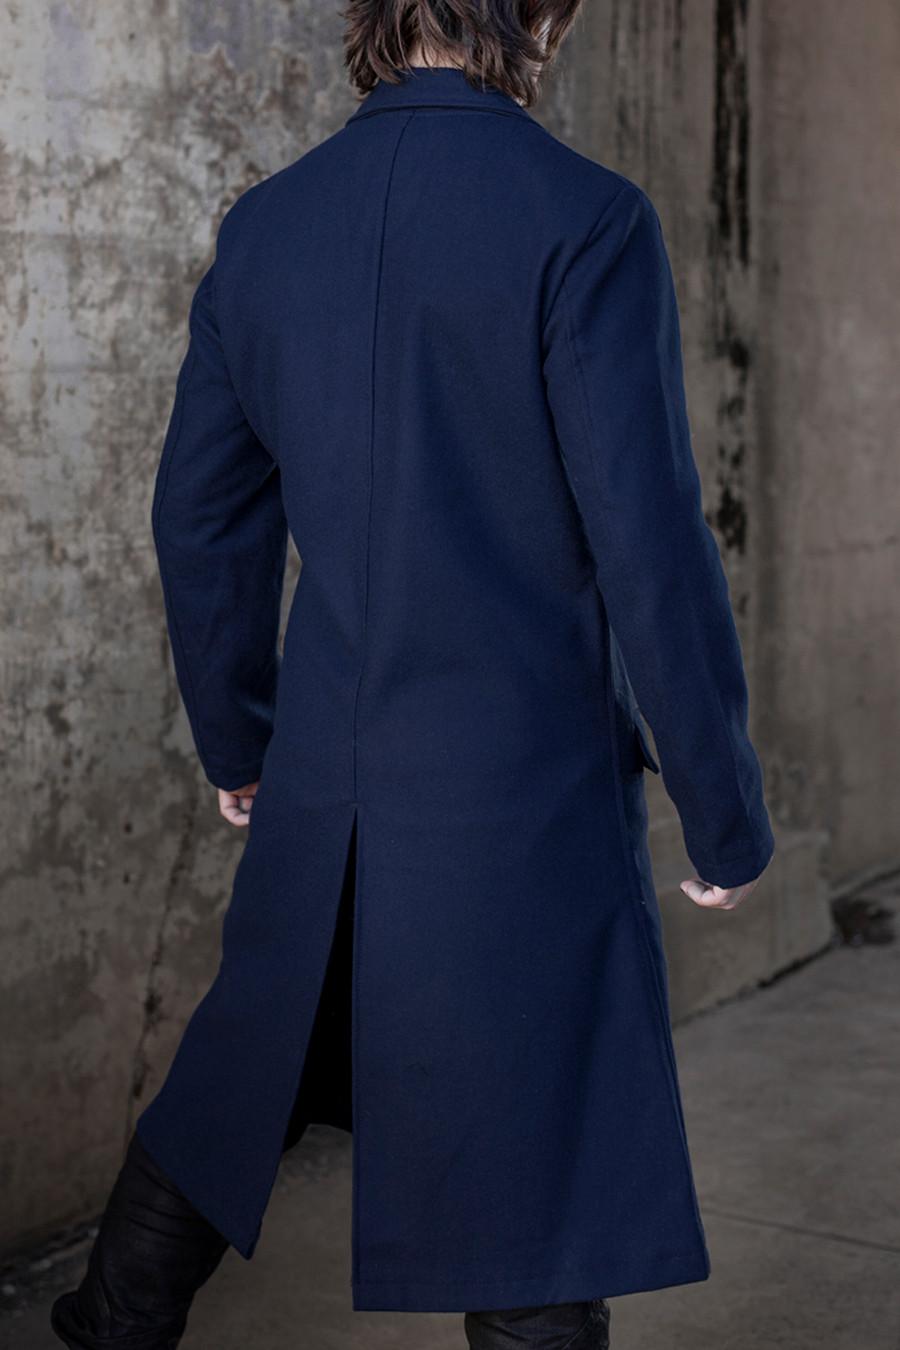 Bespin Lightcoat